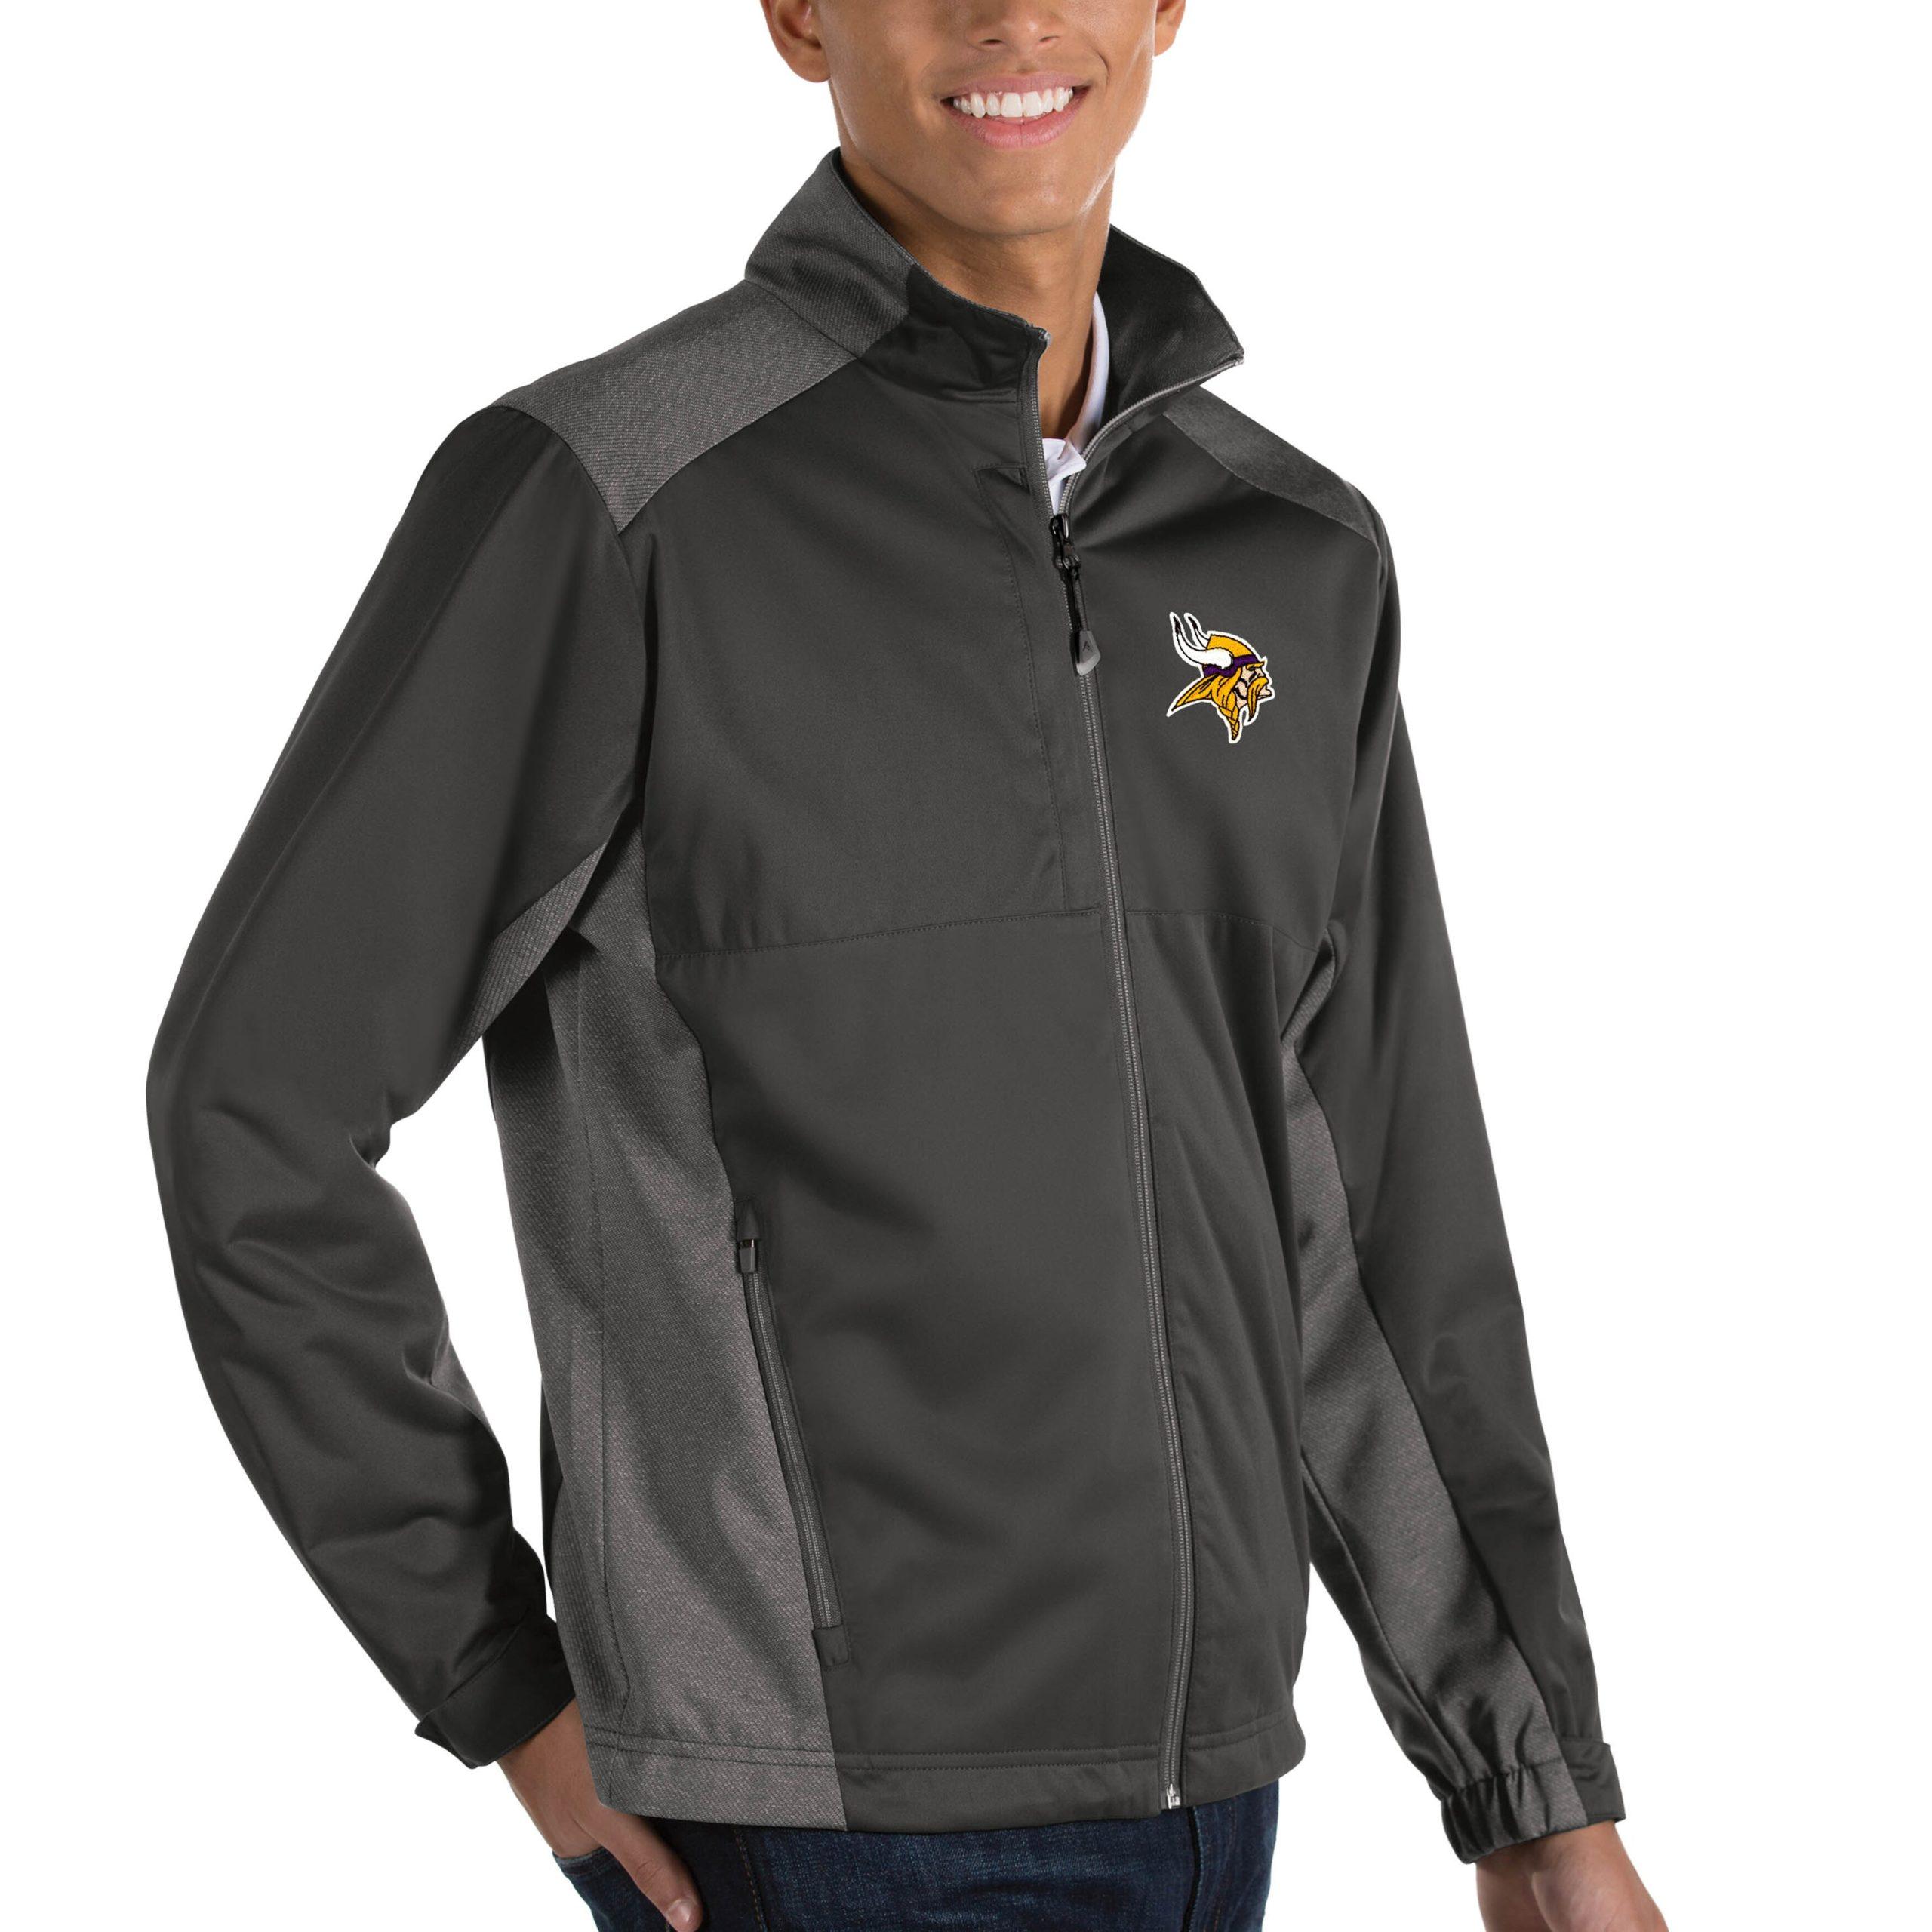 Minnesota Vikings Antigua Revolve Big & Tall Full-Zip Jacket - Heather Charcoal